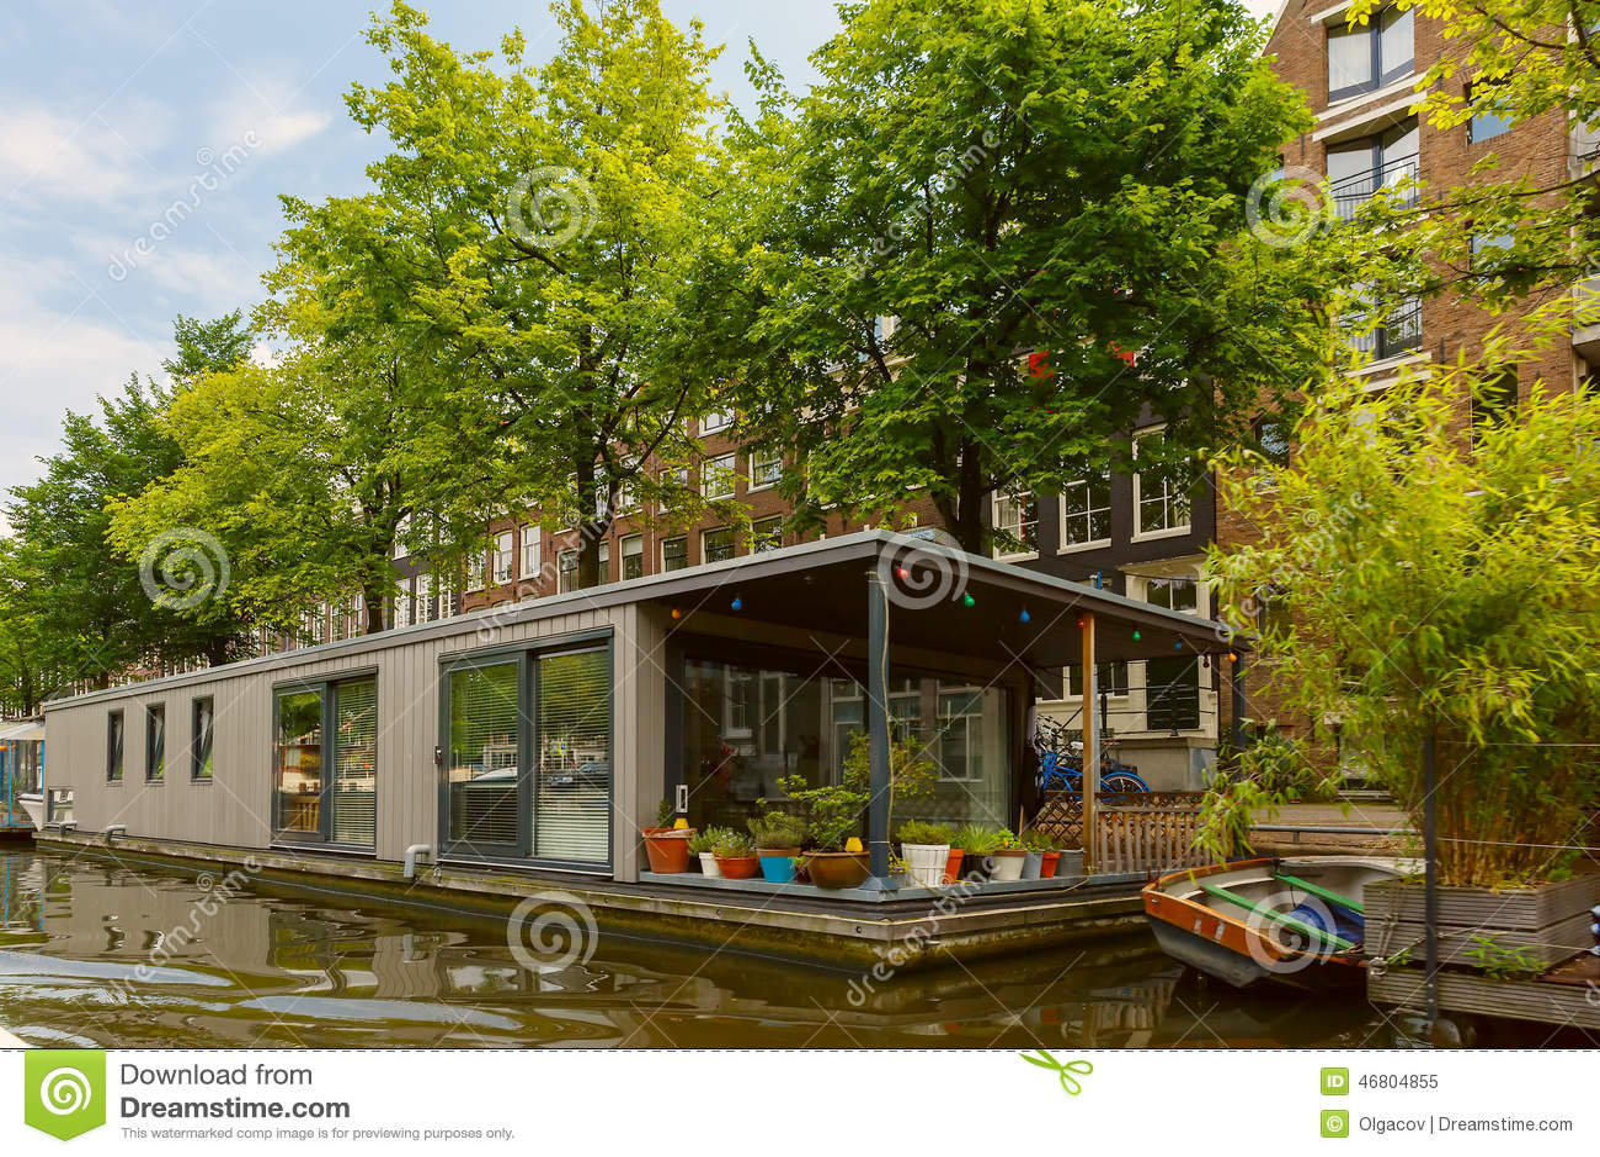 stadsmening van het kanaal van amsterdam en woonboot holland nederland stock afbeelding. Black Bedroom Furniture Sets. Home Design Ideas